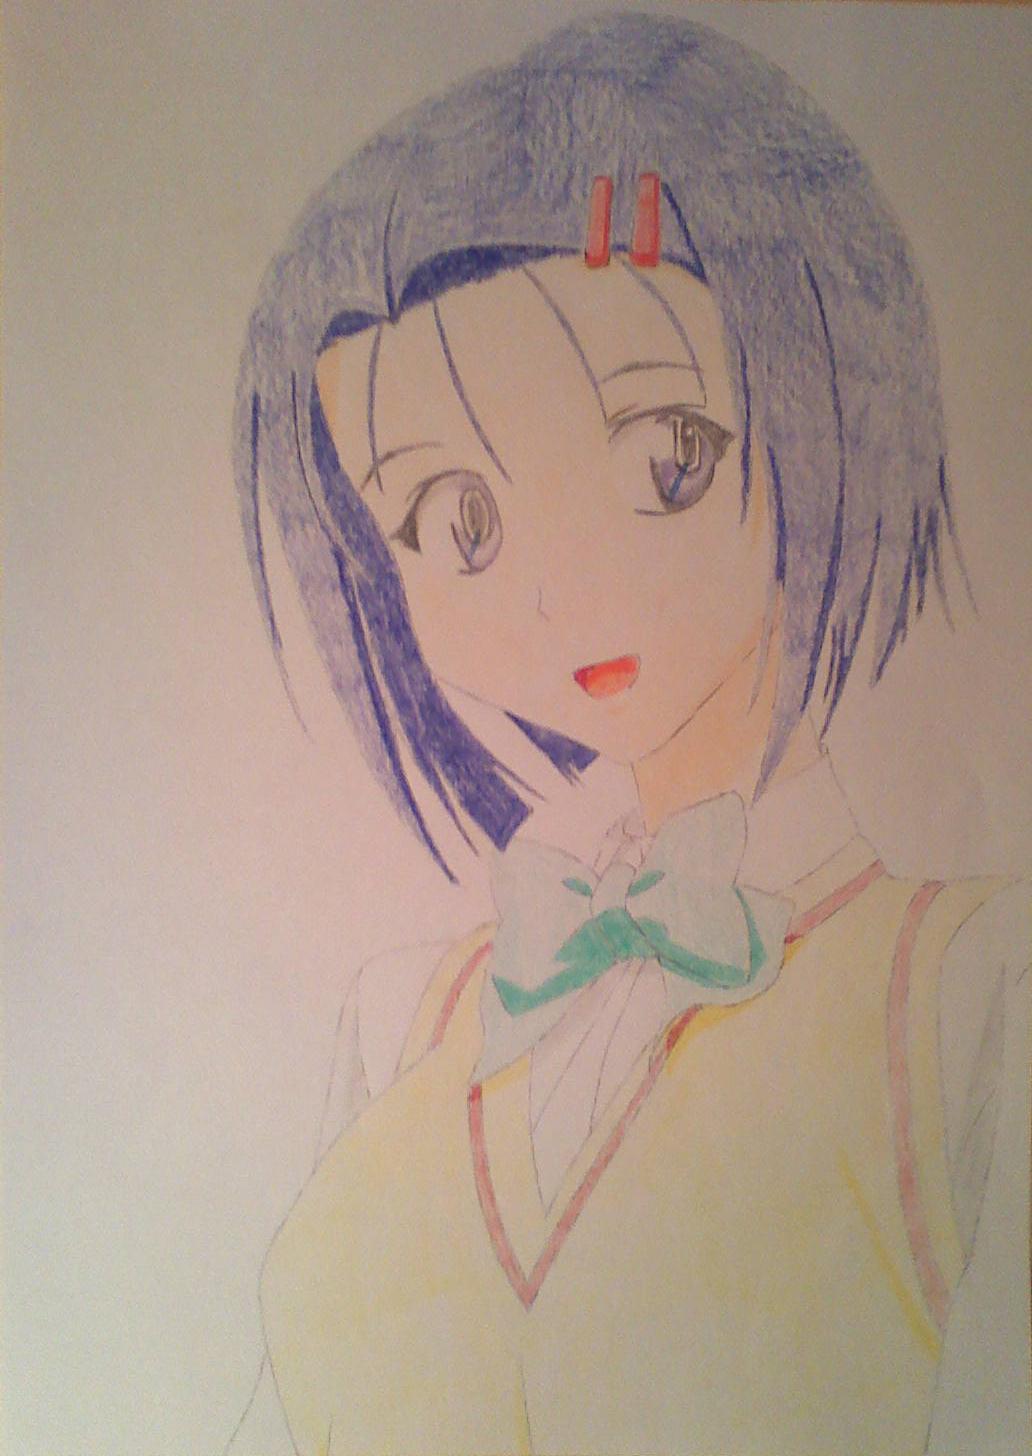 http://fc06.deviantart.net/fs51/f/2009/297/f/0/Haruna_Sairenji_by_arsinoe47.jpg